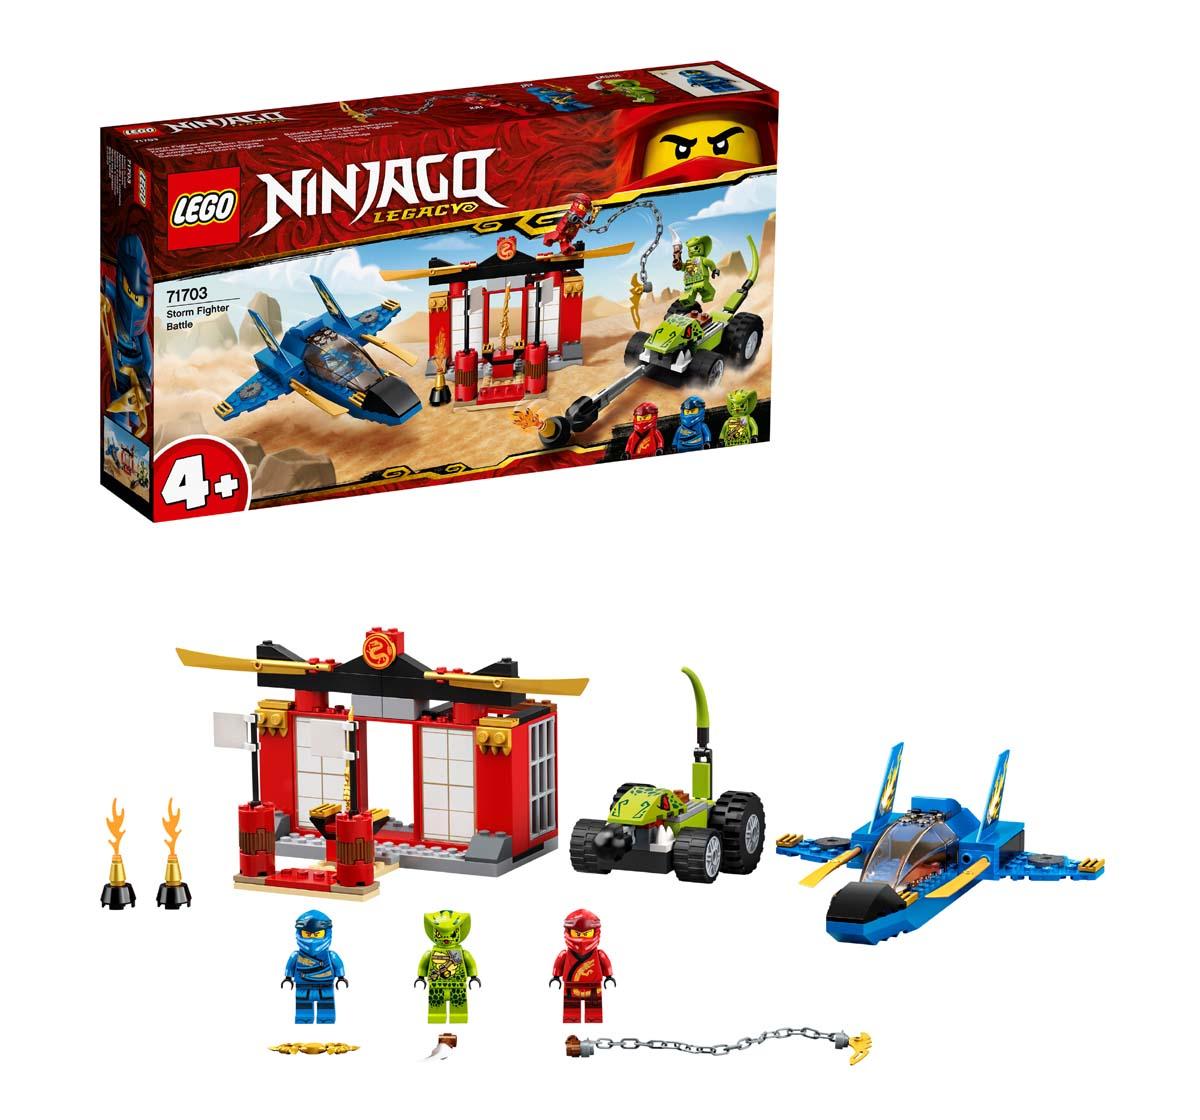 LEGO | Lego Storm Fighter Battle Lego Blocks for Kids Age 4Y+